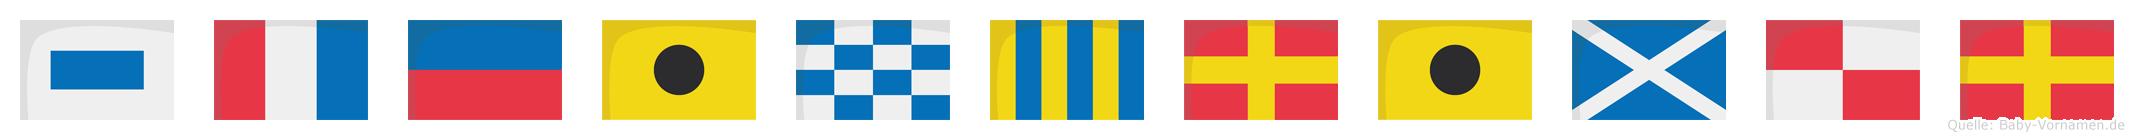 Steingrimur im Flaggenalphabet